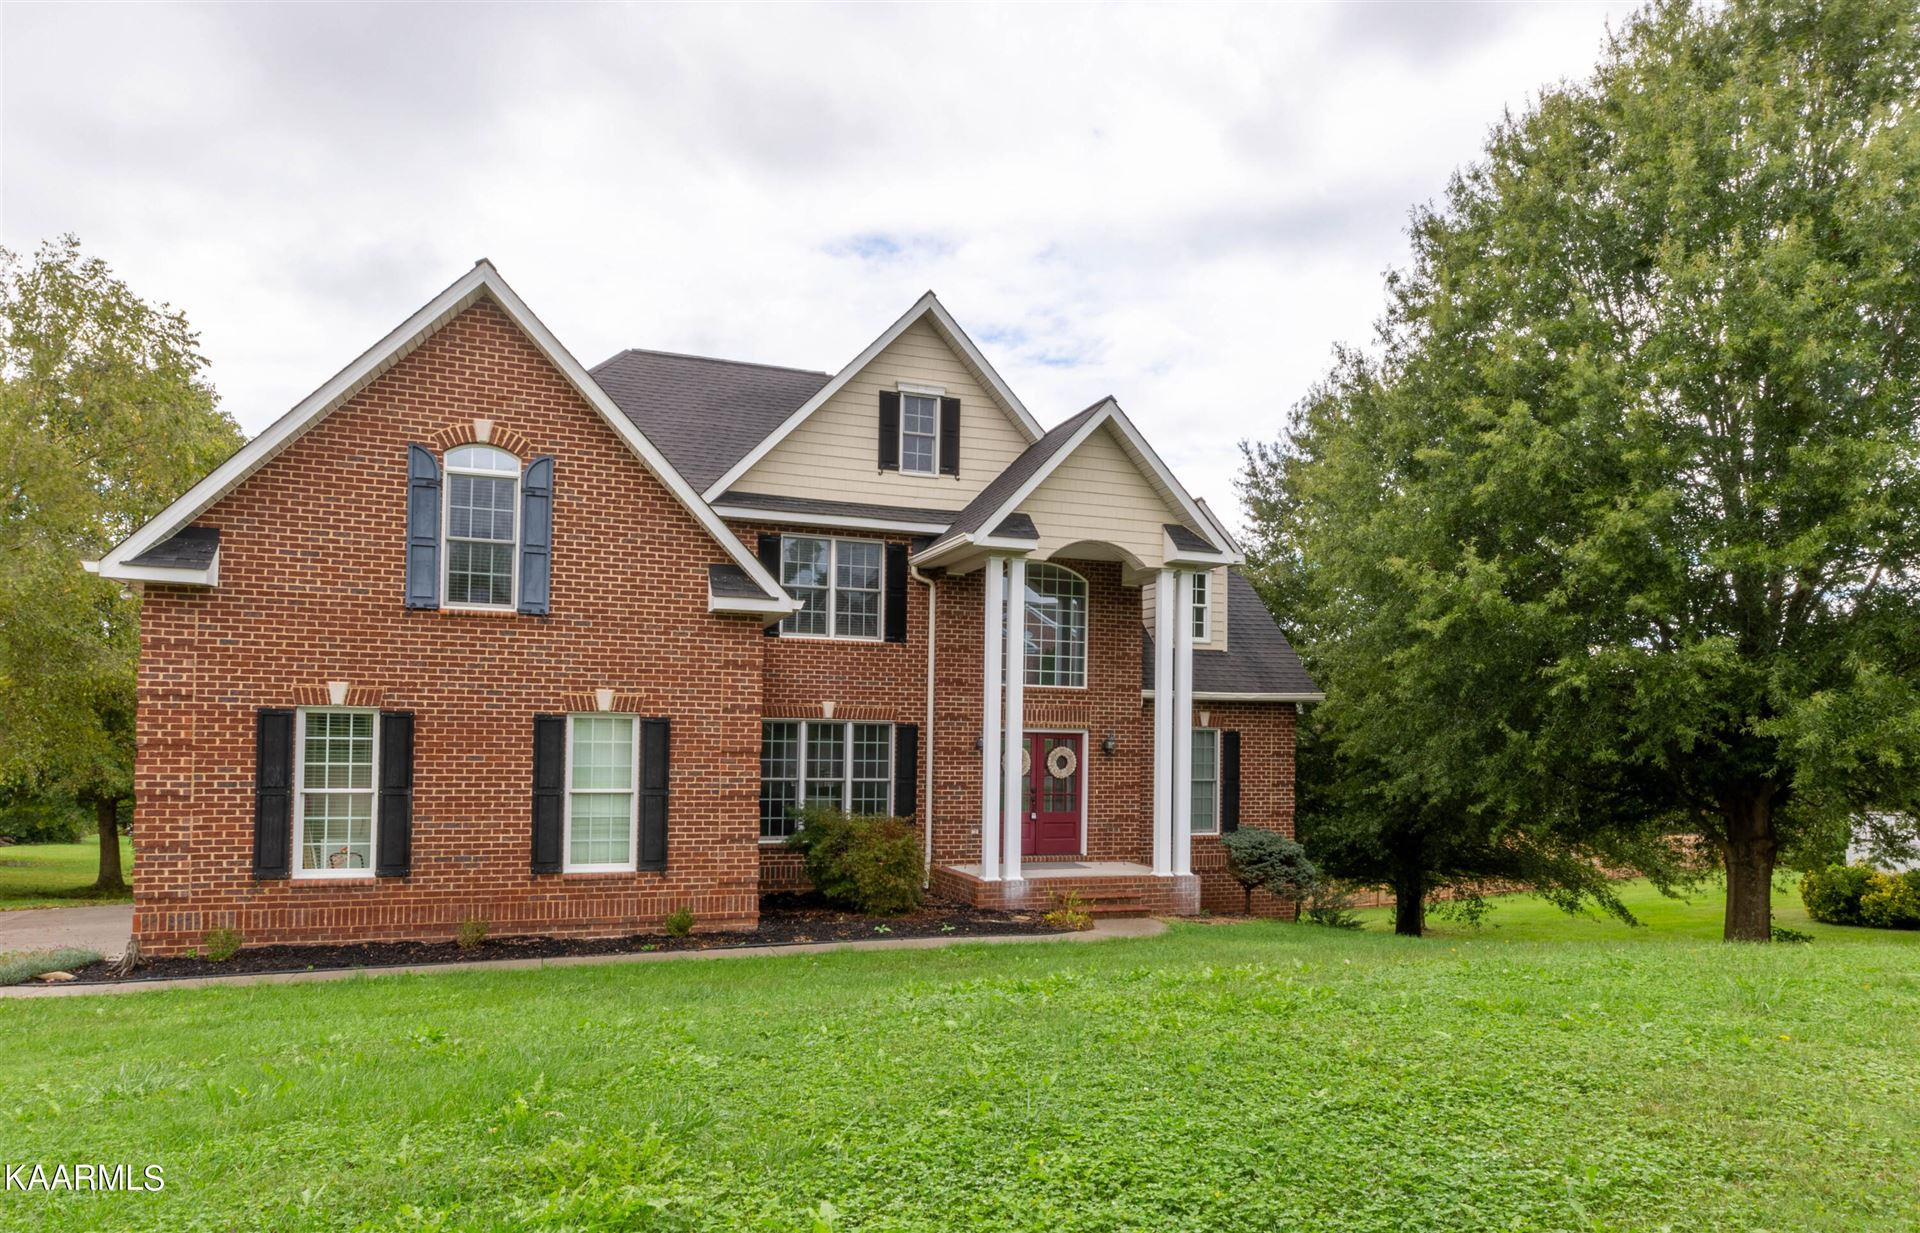 Photo of 7801 Statley Oaks Lane, Knoxville, TN 37938 (MLS # 1171436)